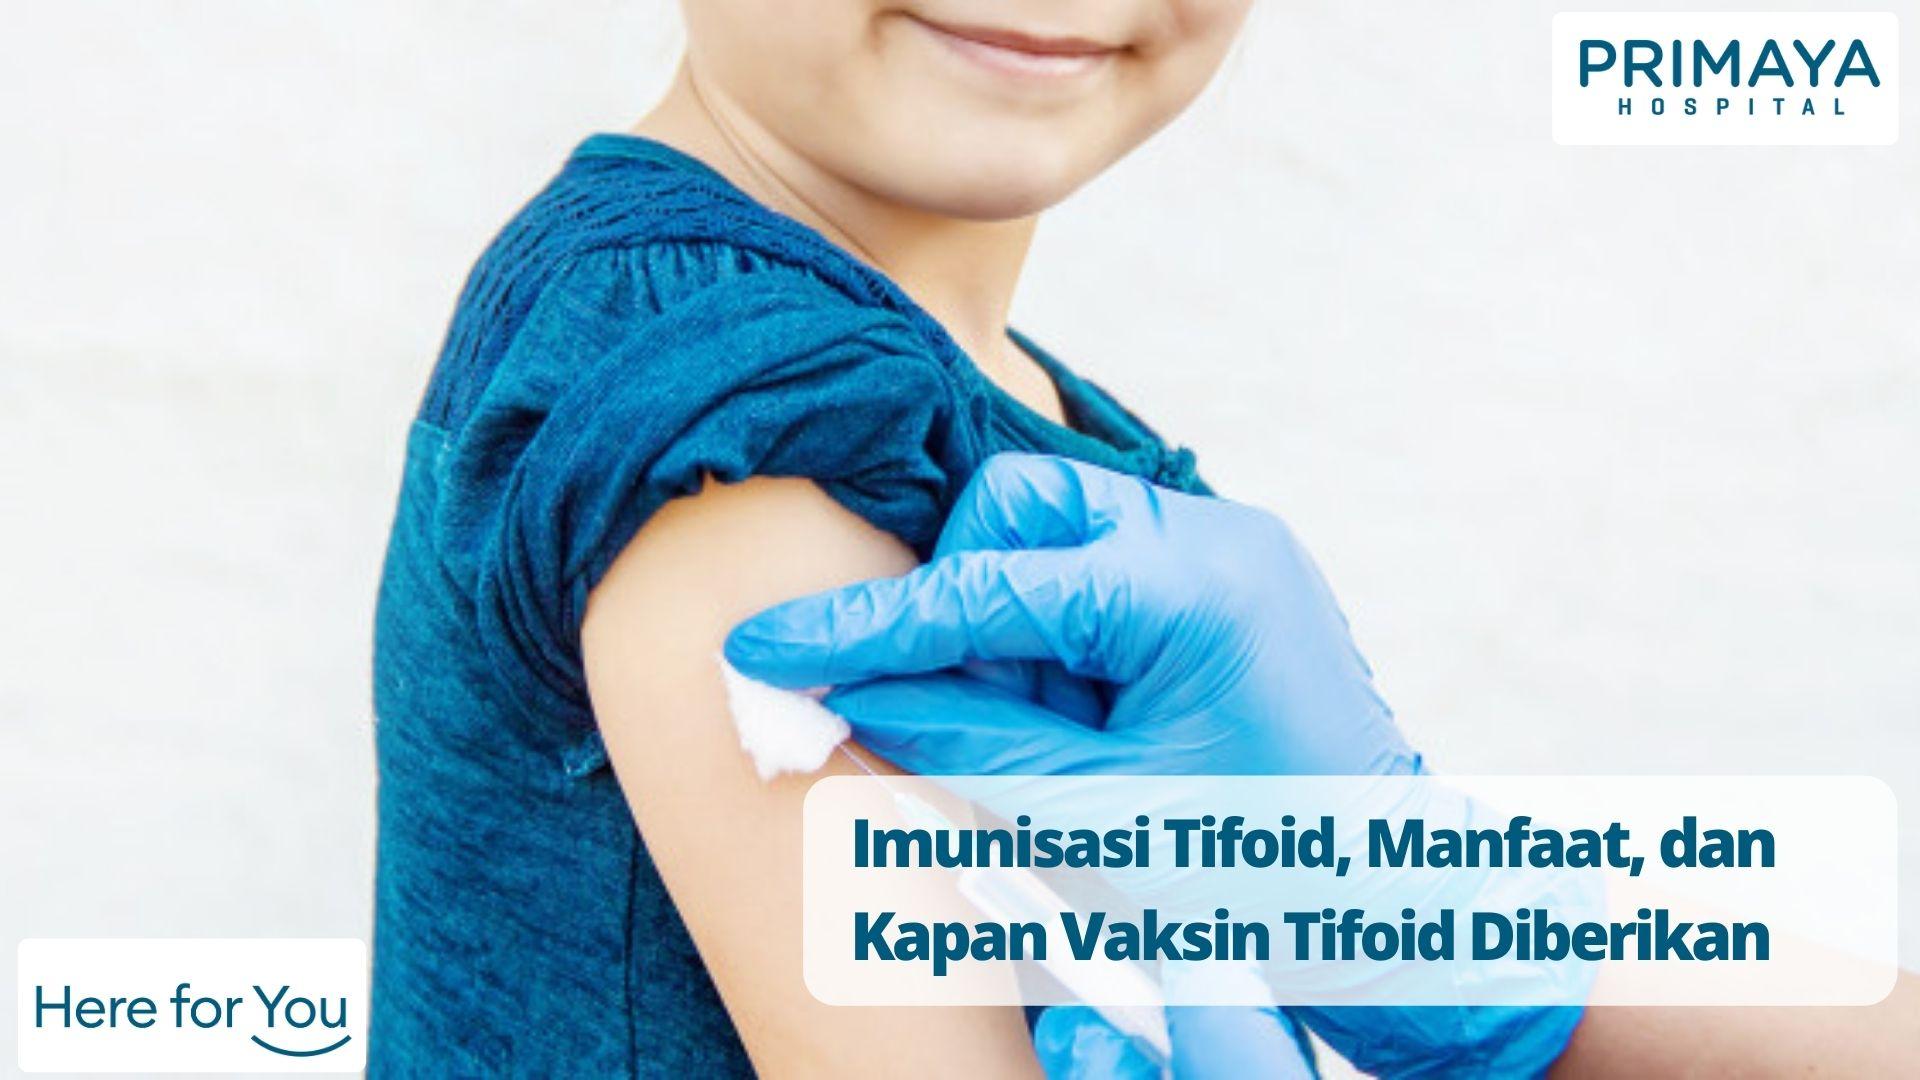 Imunisasi Tifoid, Manfaat, dan Kapan Vaksin Tifoid Diberikan